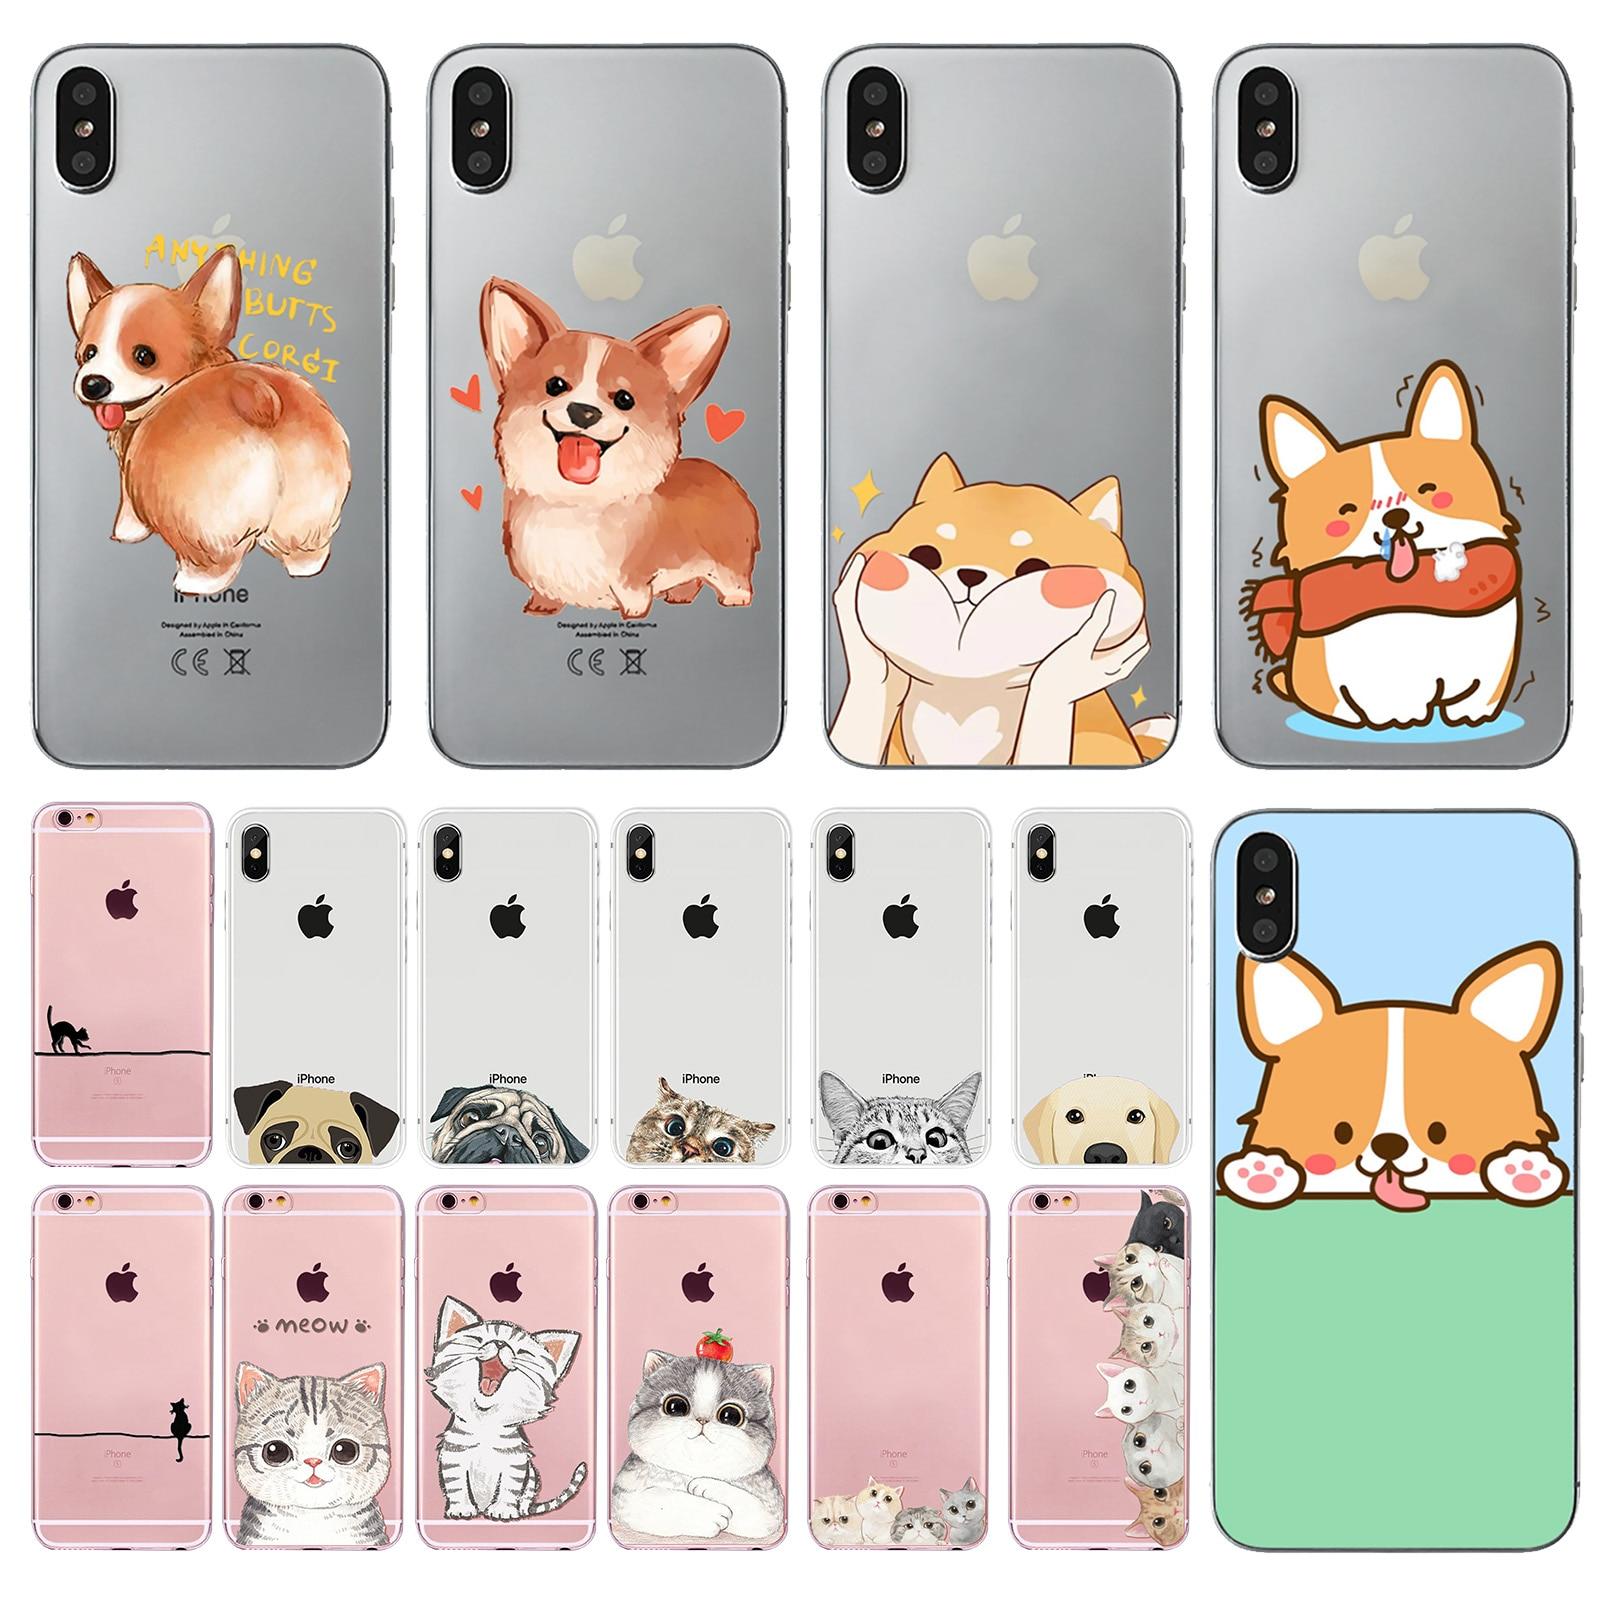 Lovely Corgi Dog Back Shell Cover For iPhoneX 10 6 6s 7 8 Plus Cute Cat Animals Bulldog Soft TPU Case Celular Capa For iPhoneX